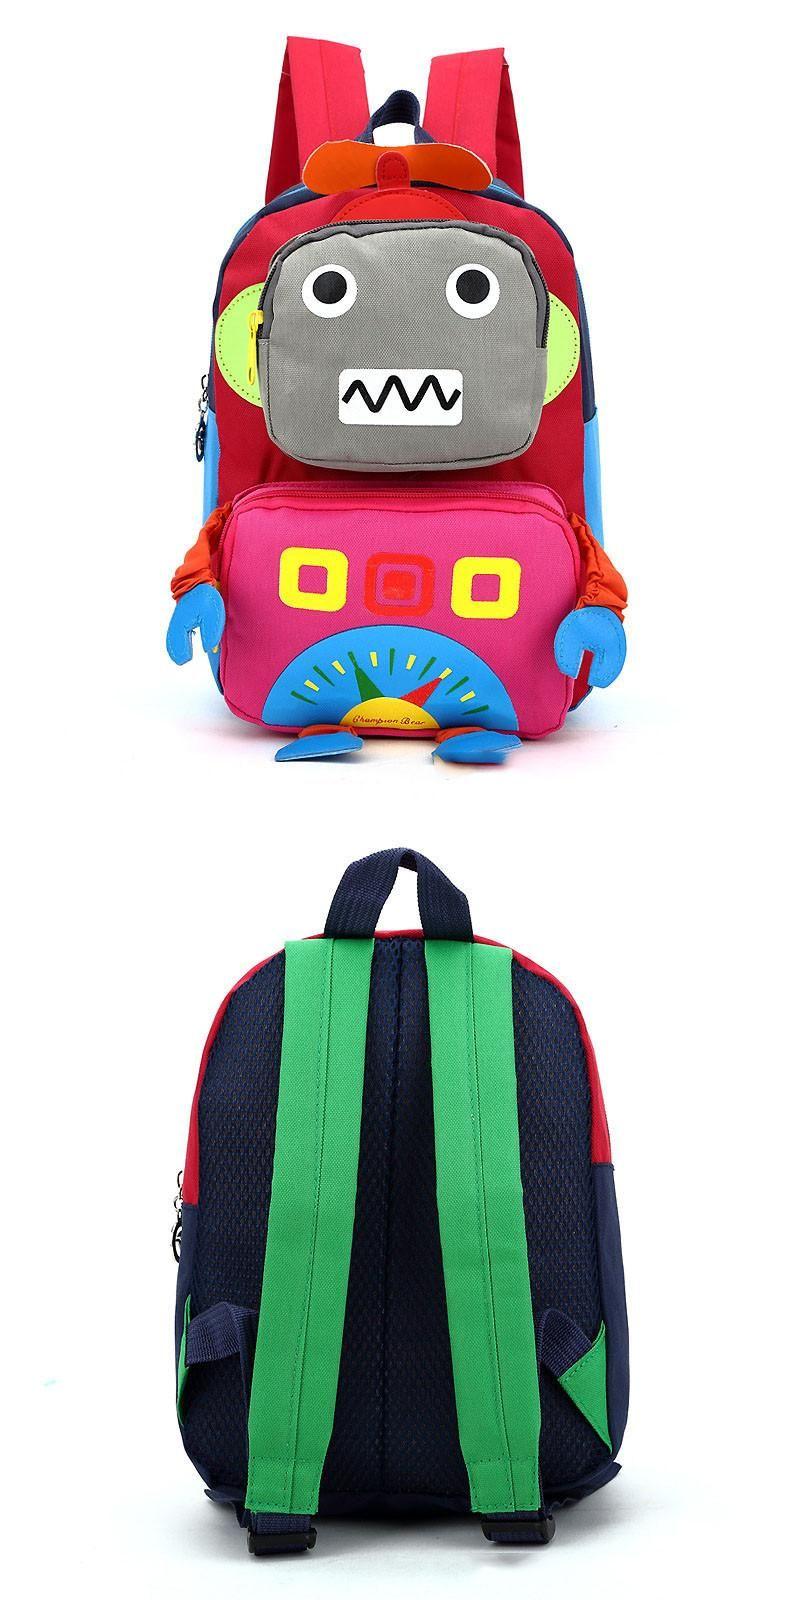 Toddler Backpack Robot Kindergarten Preschool Bag 3D Cute Cartoon Kids Schoolbag for Boys and Girls